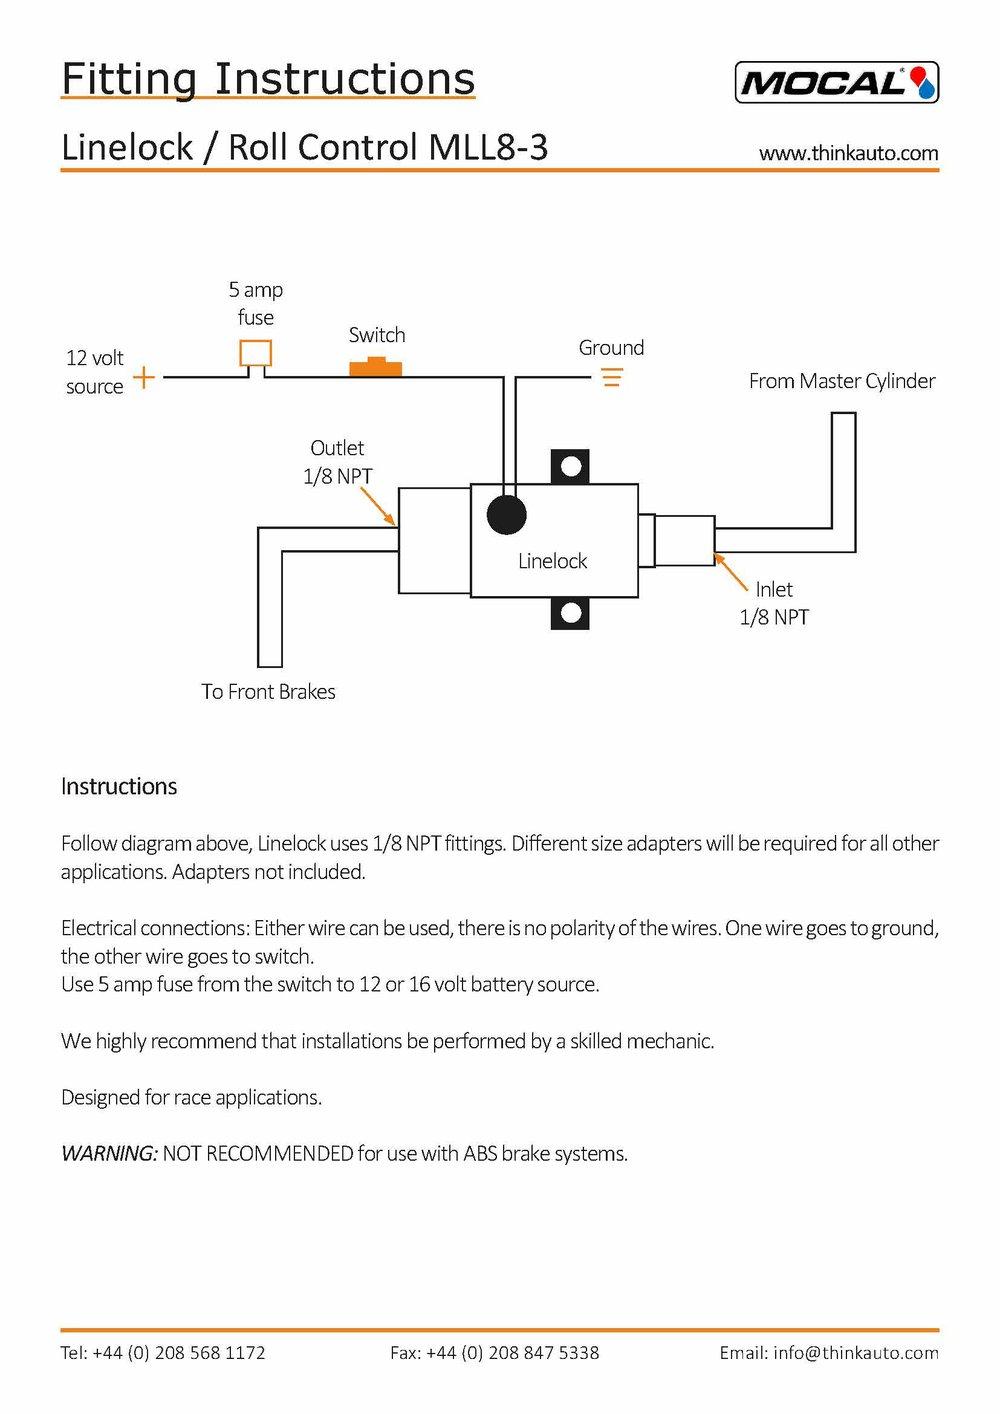 Linelock Instructions.jpg